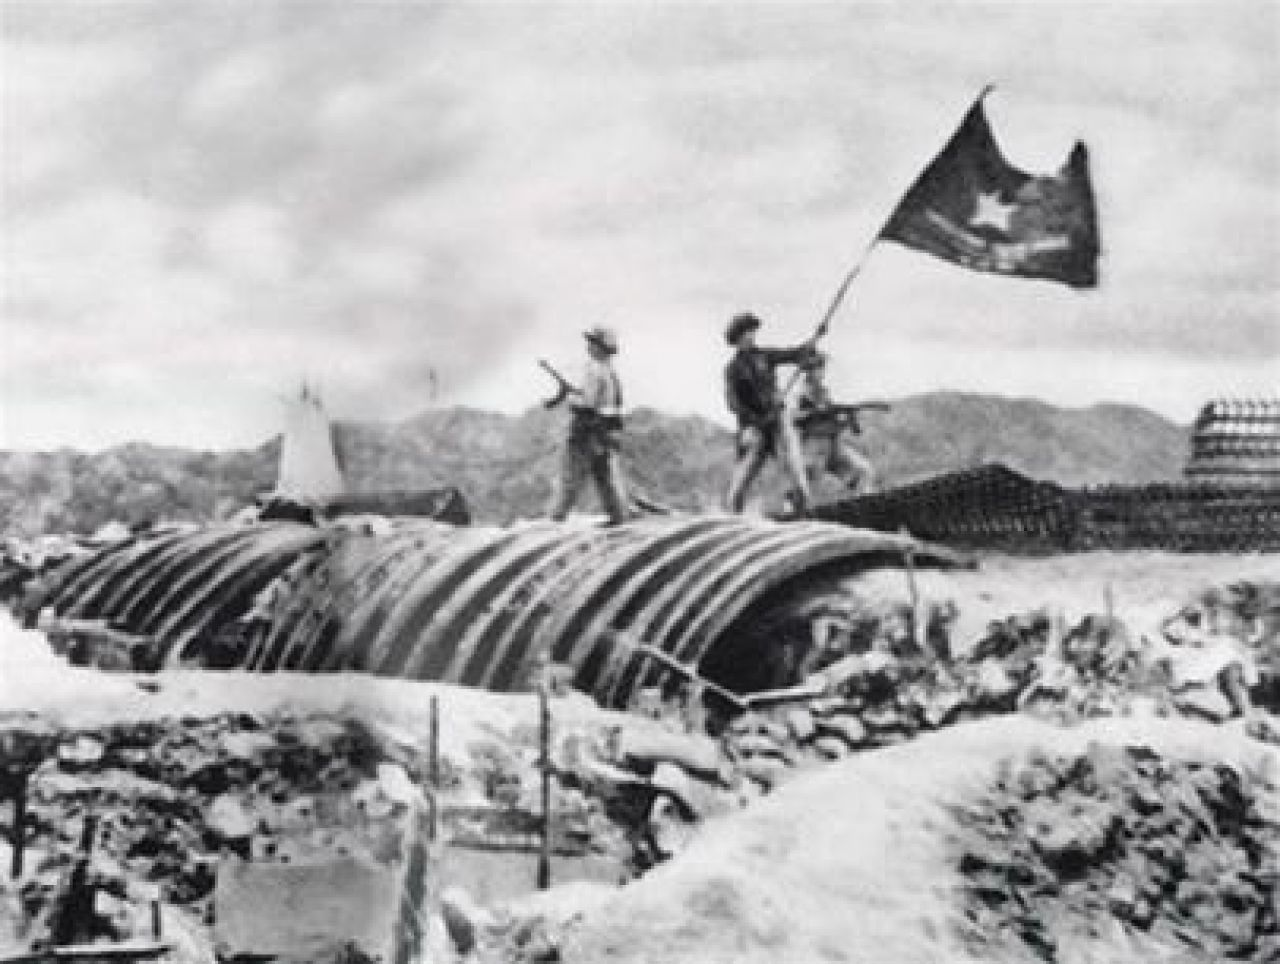 The Demystified Zone Victorious Viet Minh at Dien Bien Phu